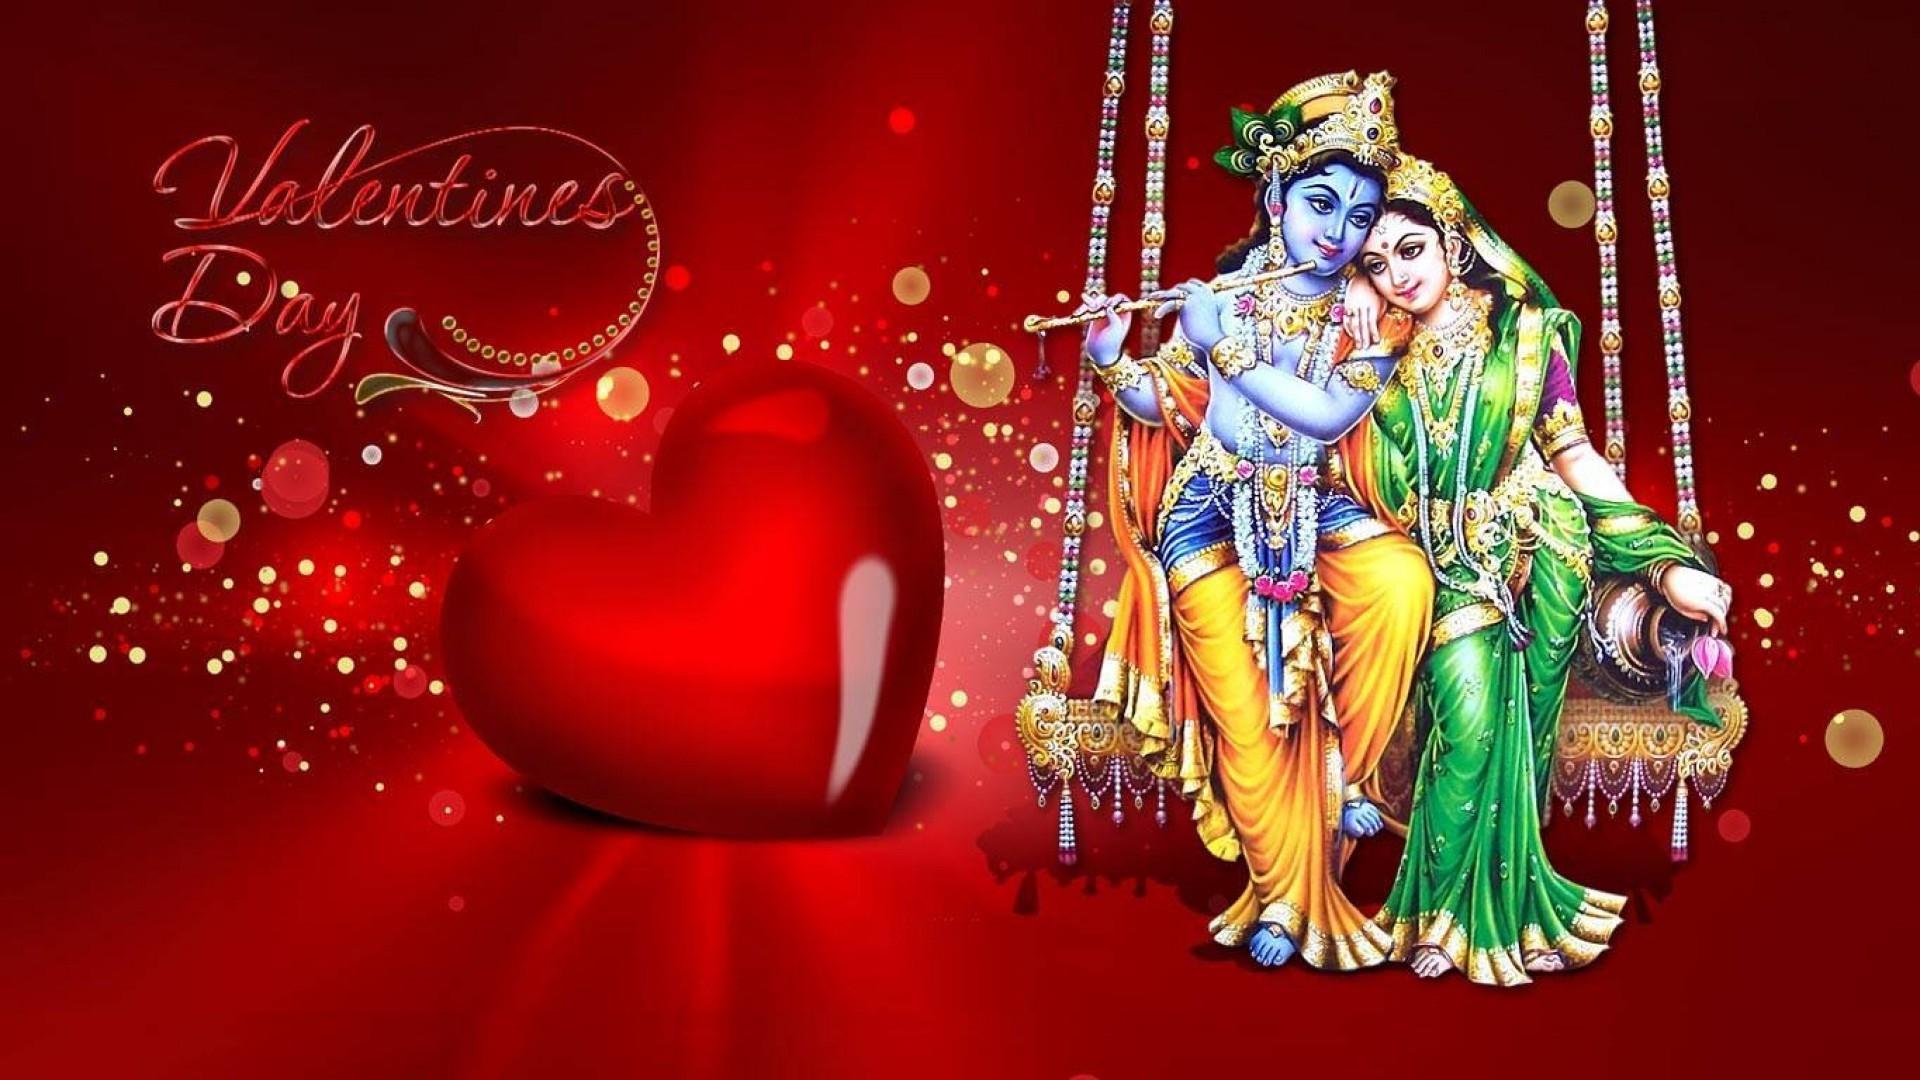 Romantic Radha Krishna Wallpaper Hd Radha Krishna Hd Wallpapers 68 Images